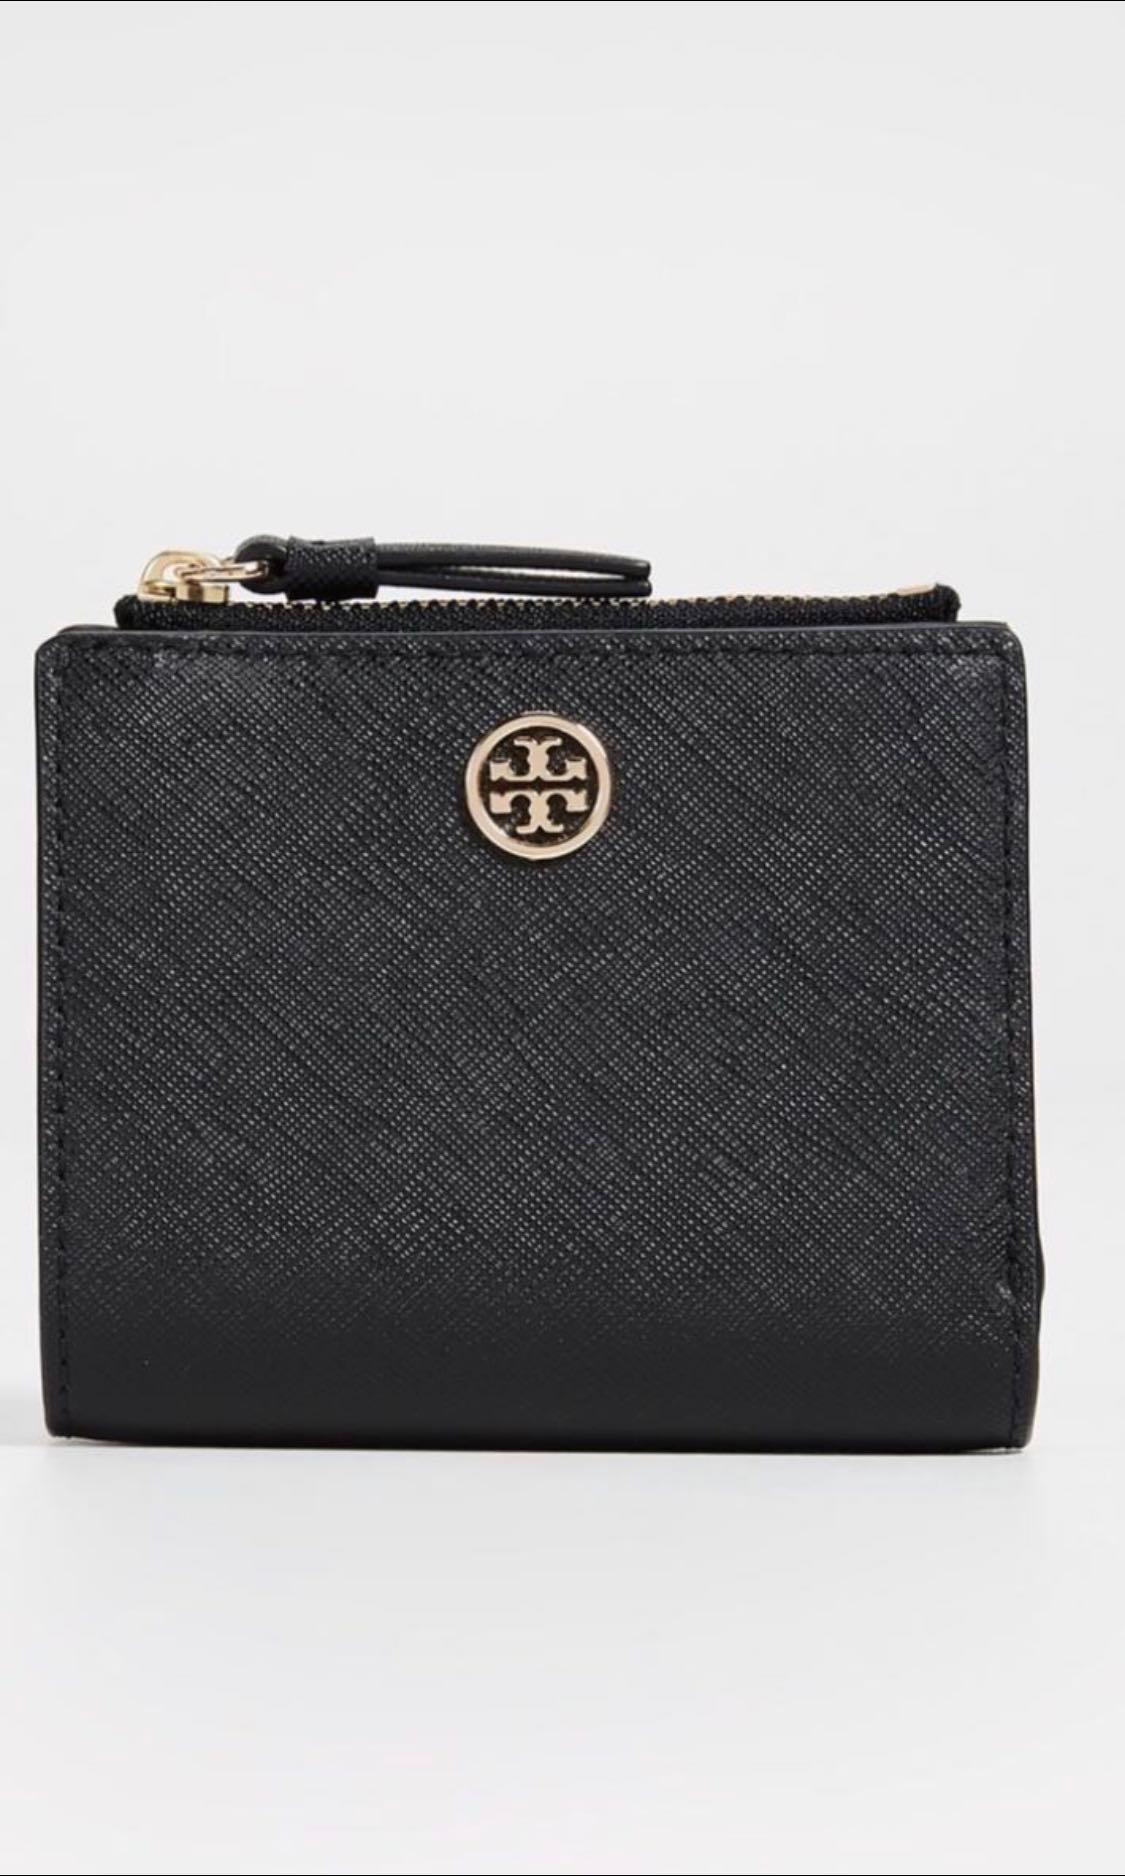 2c91439db33 Tory Burch Wallet, Women's Fashion, Bags & Wallets, Wallets on Carousell